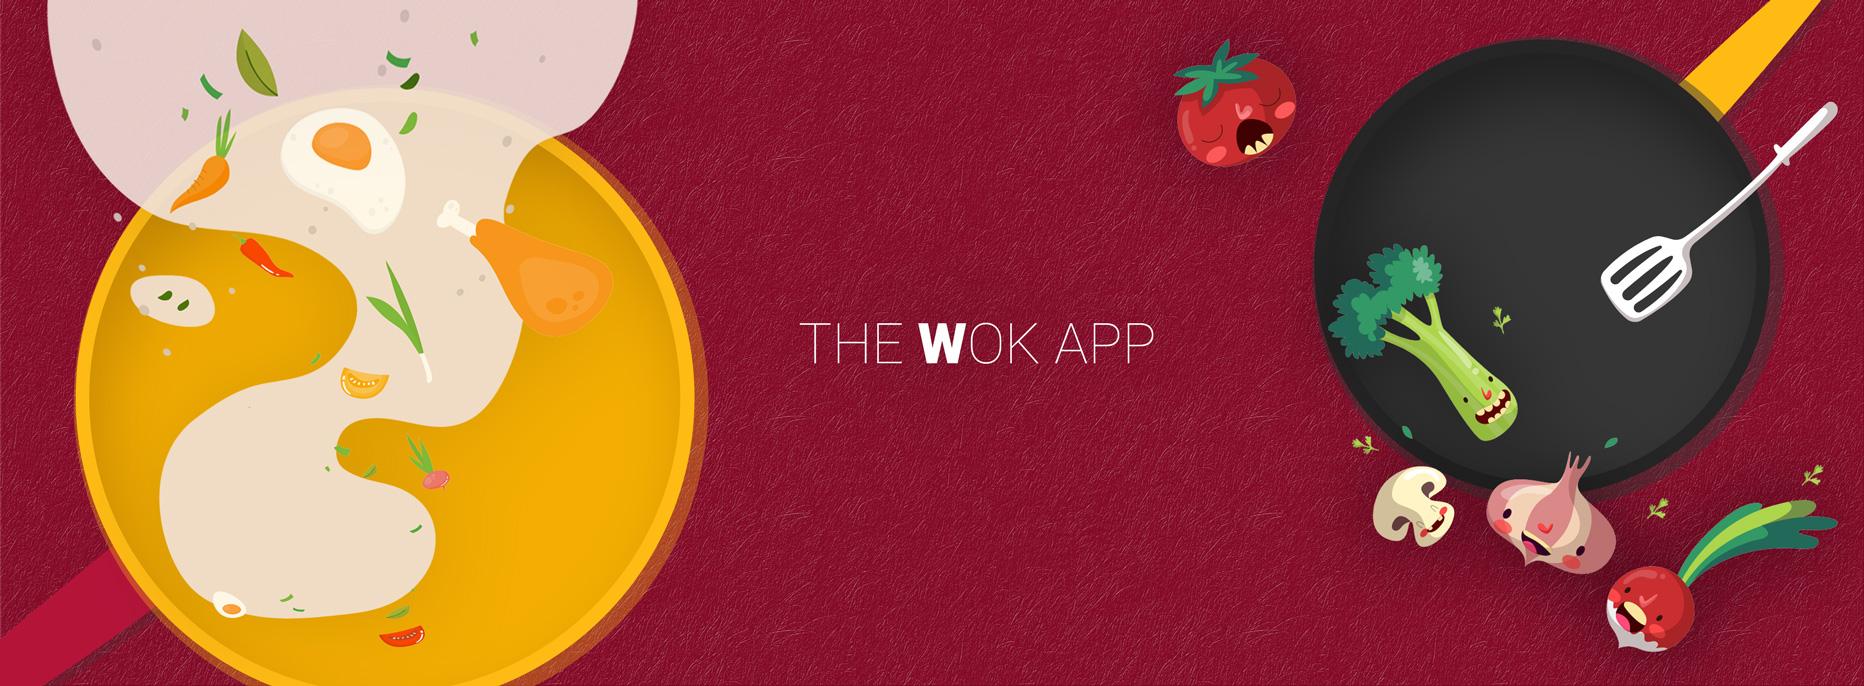 Wok App Img